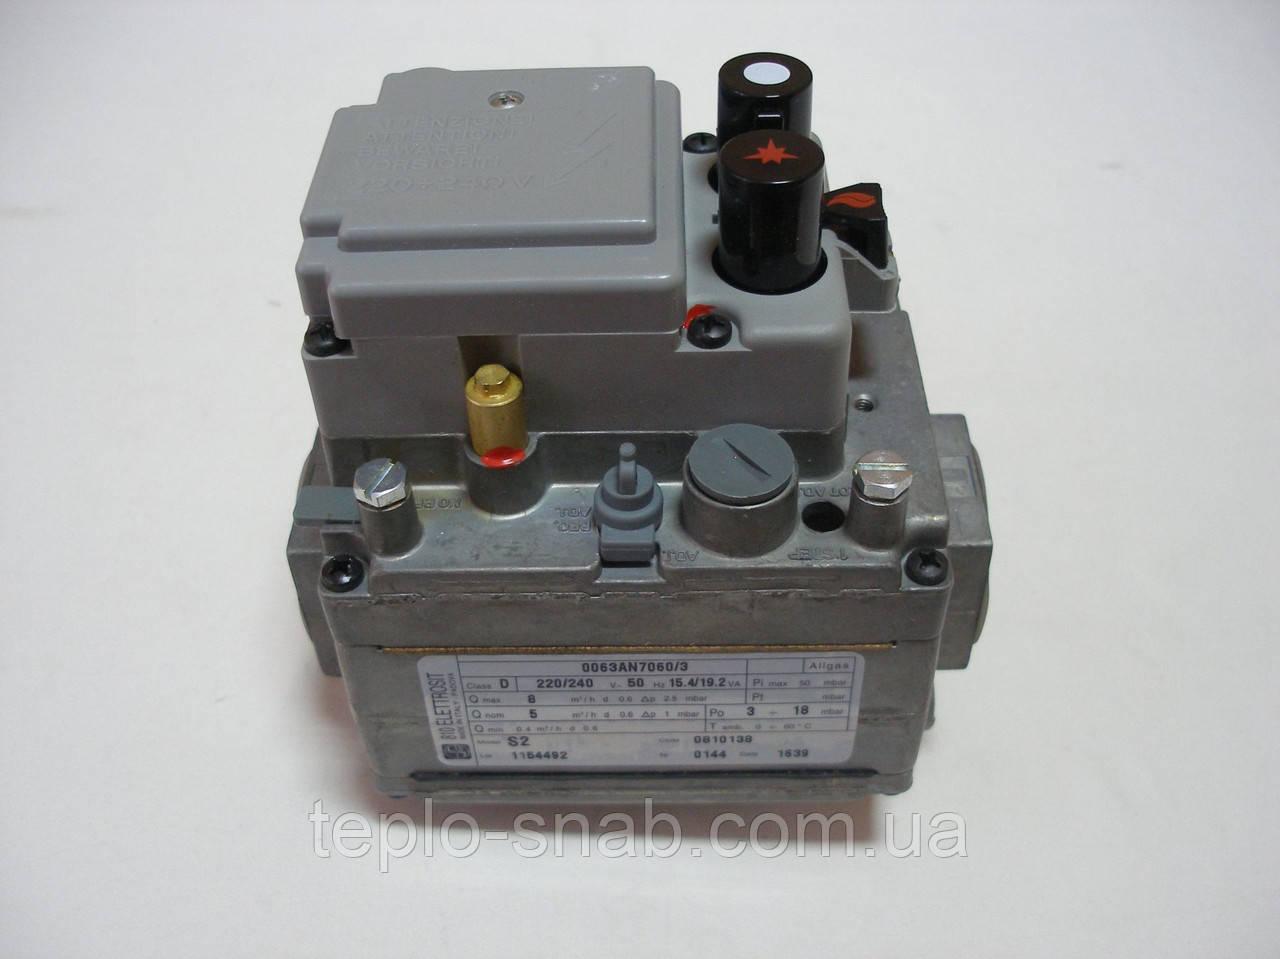 Газовий клапан 810 ELETTROSIT енергонезалежний - .0.810.138